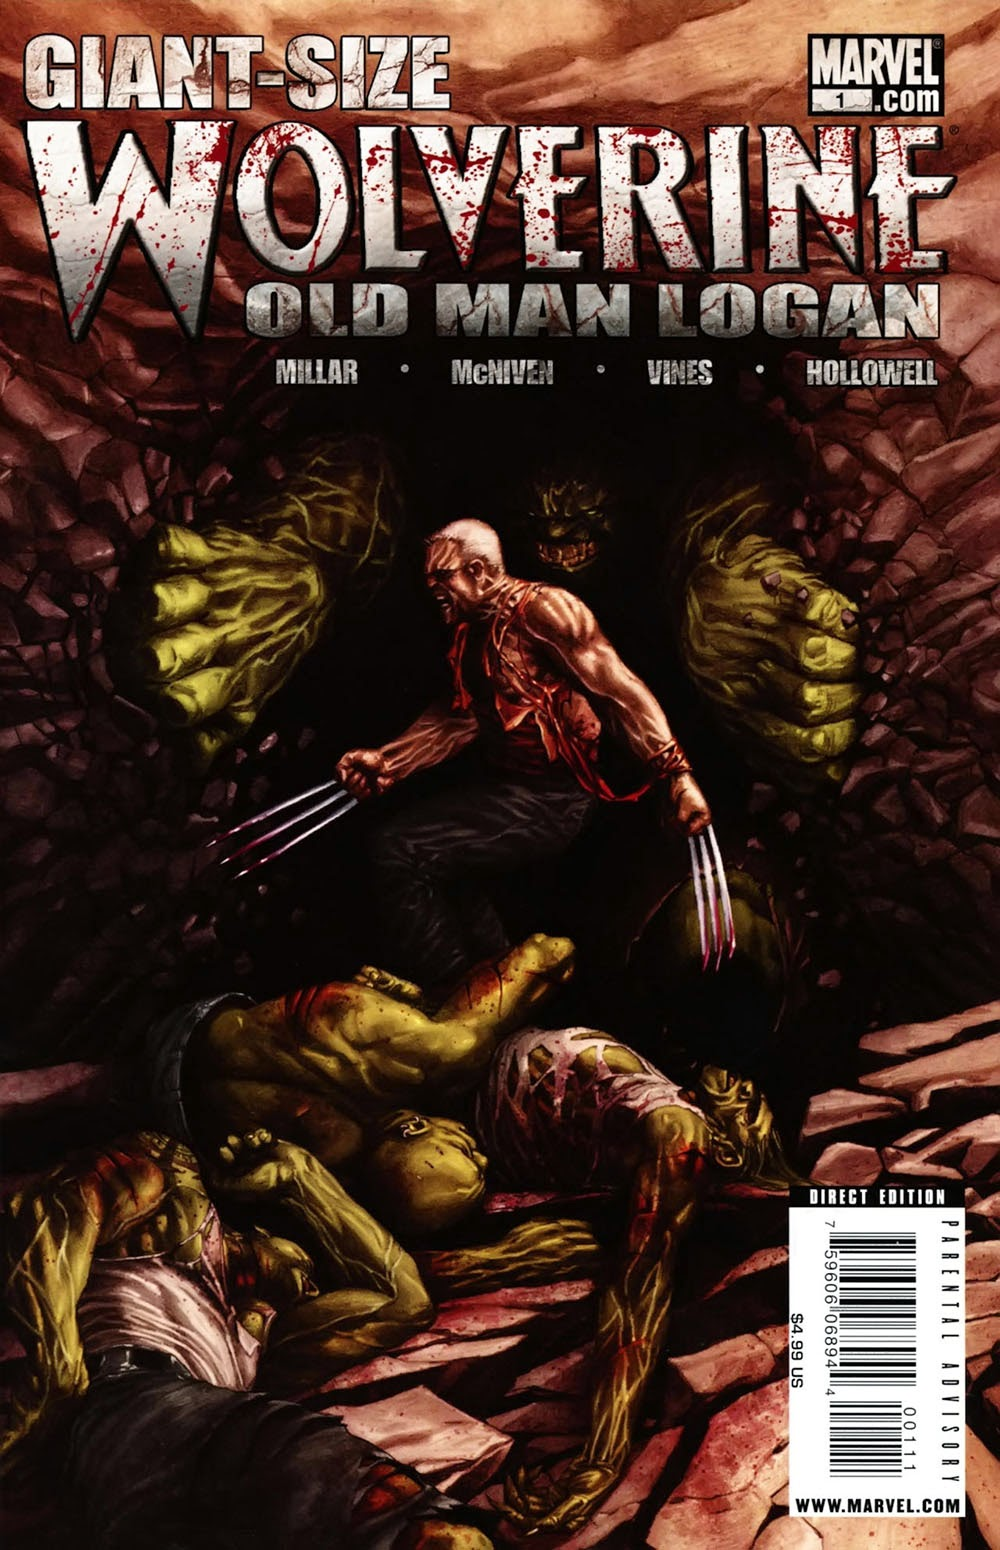 Old Man Logan Giant-Size